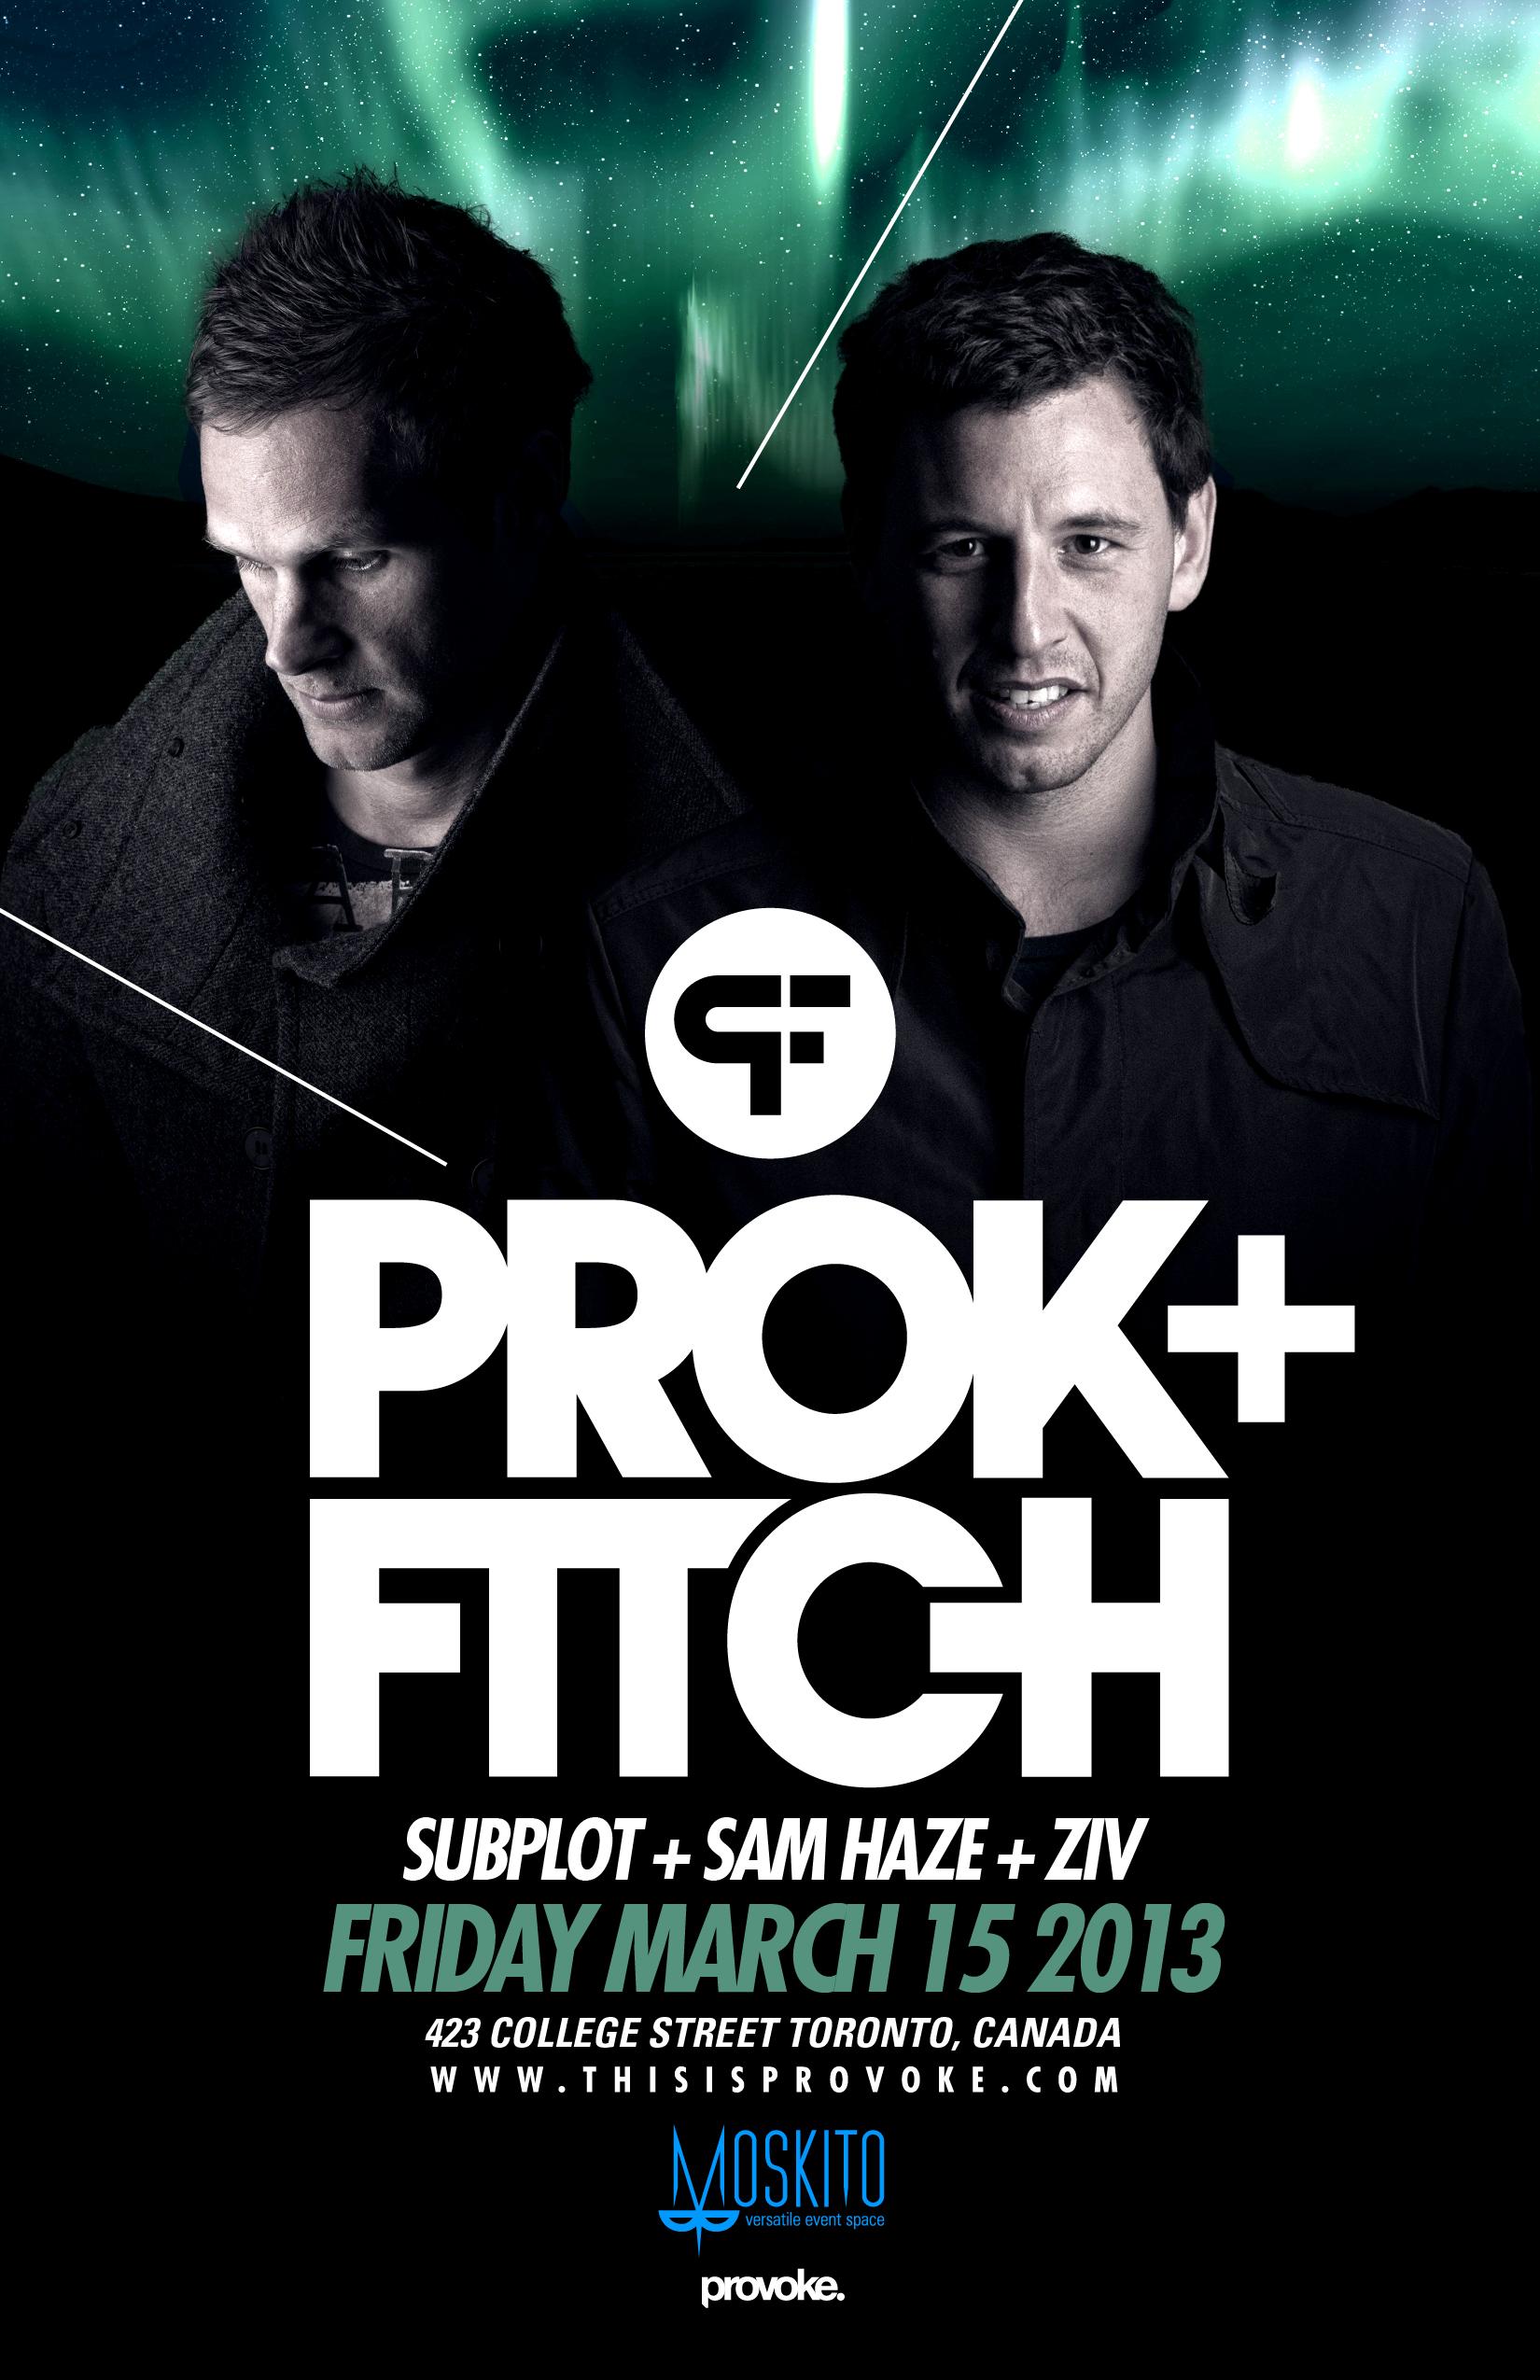 Prok + Fitch, Subplot, Sam Haze, Ziv Toronto Moskito